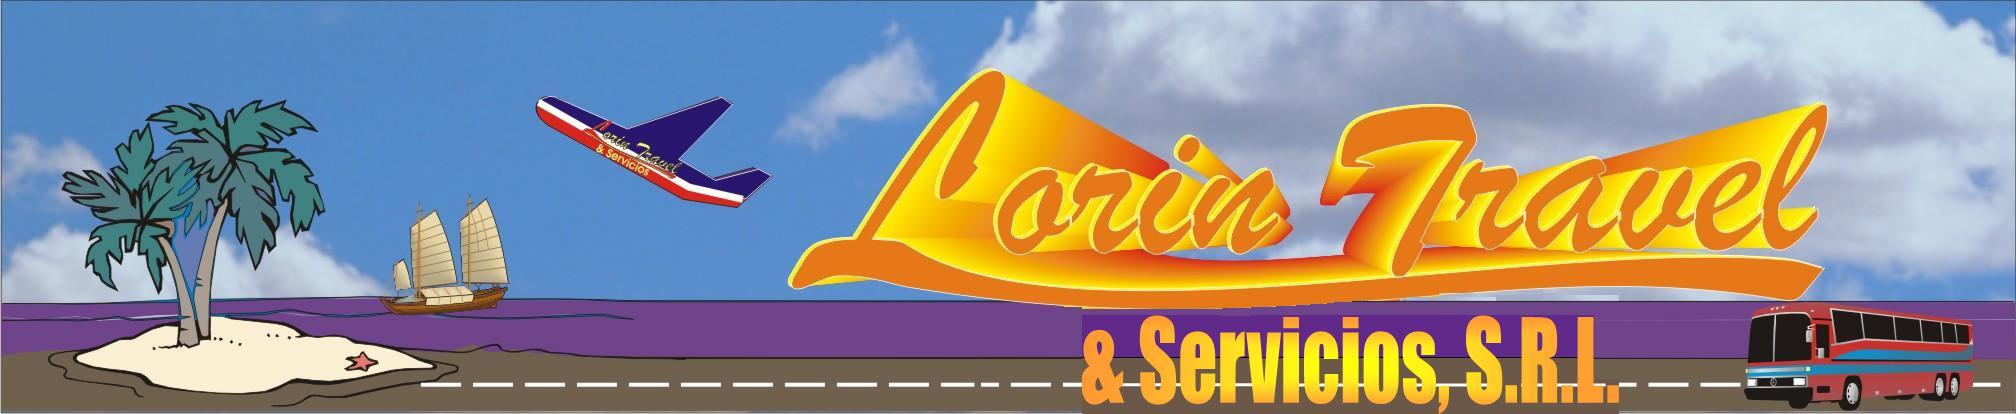 Lorin Travel & Servicios